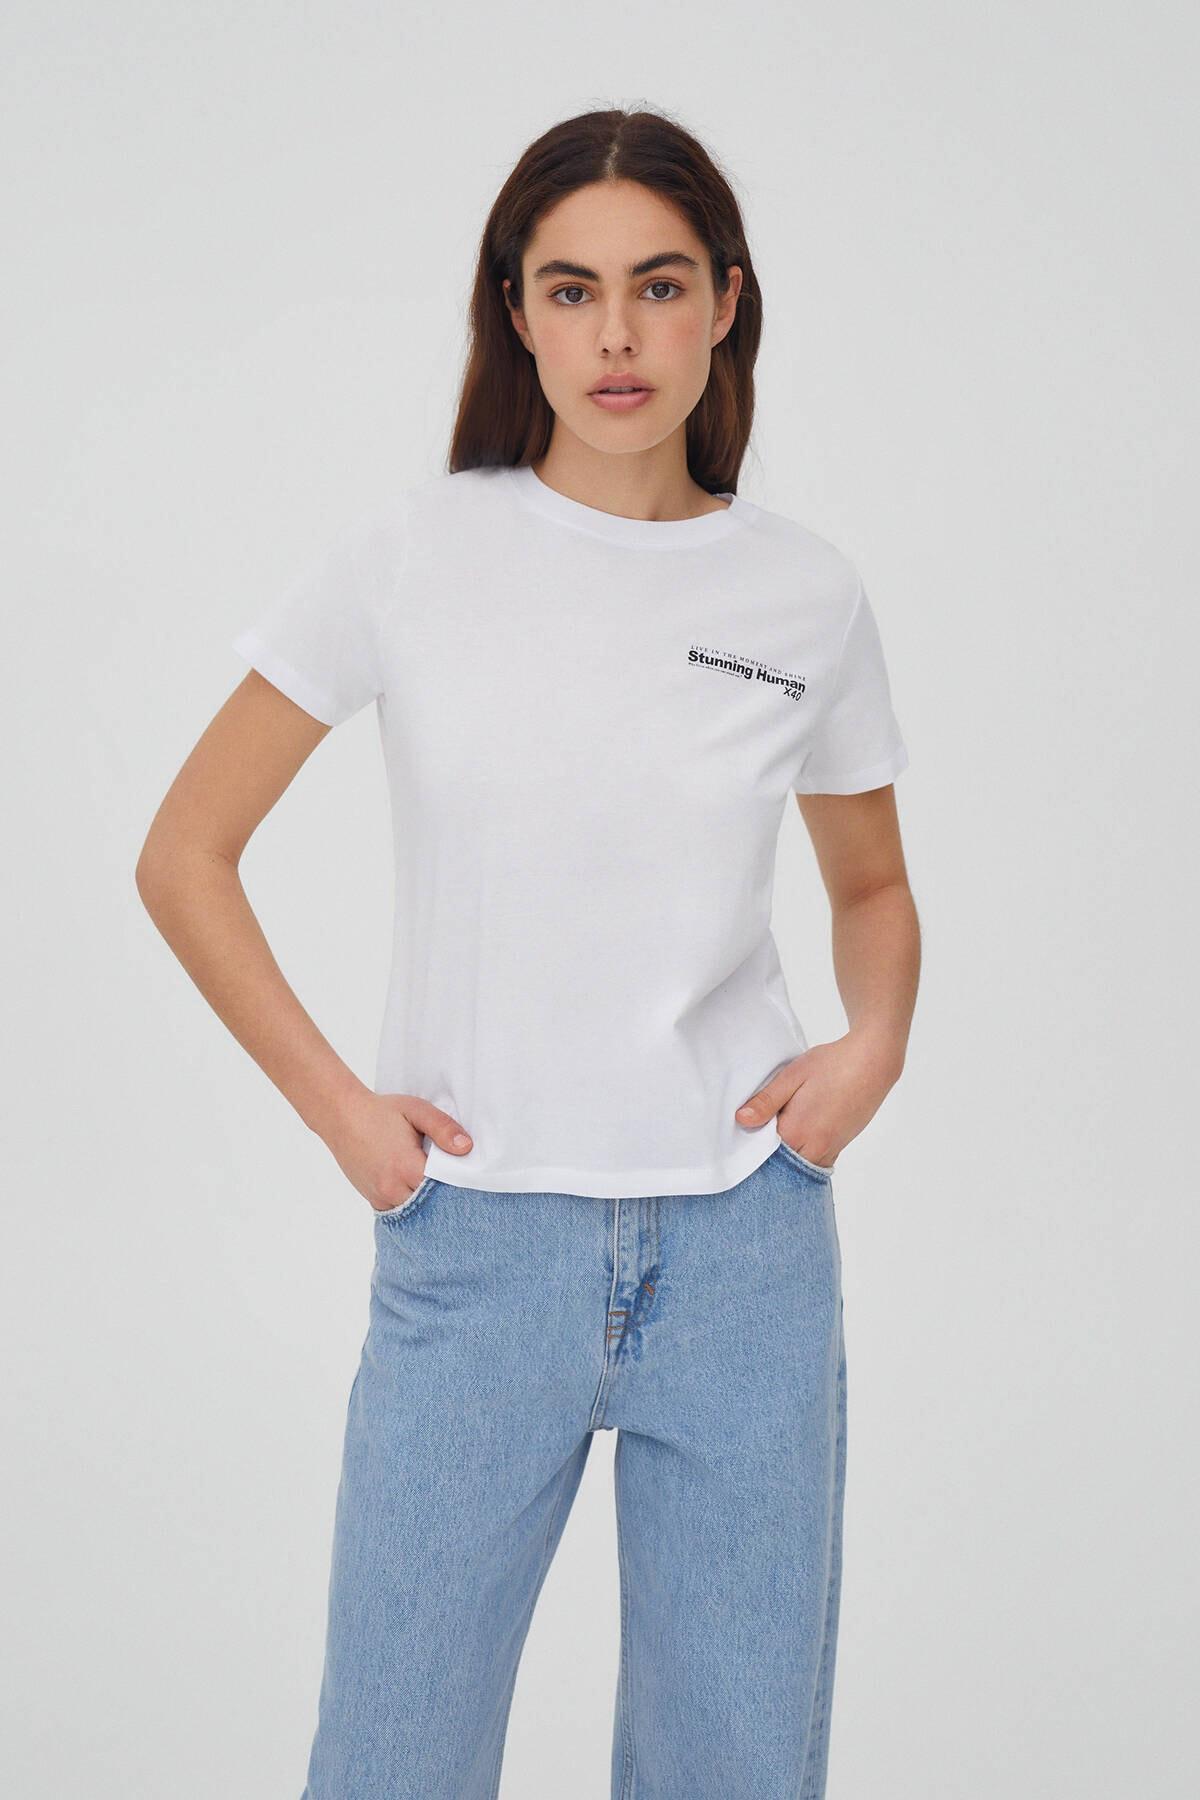 Pull & Bear Kadın Beyaz Kontrast Sloganlı Pamuklu T-shirt